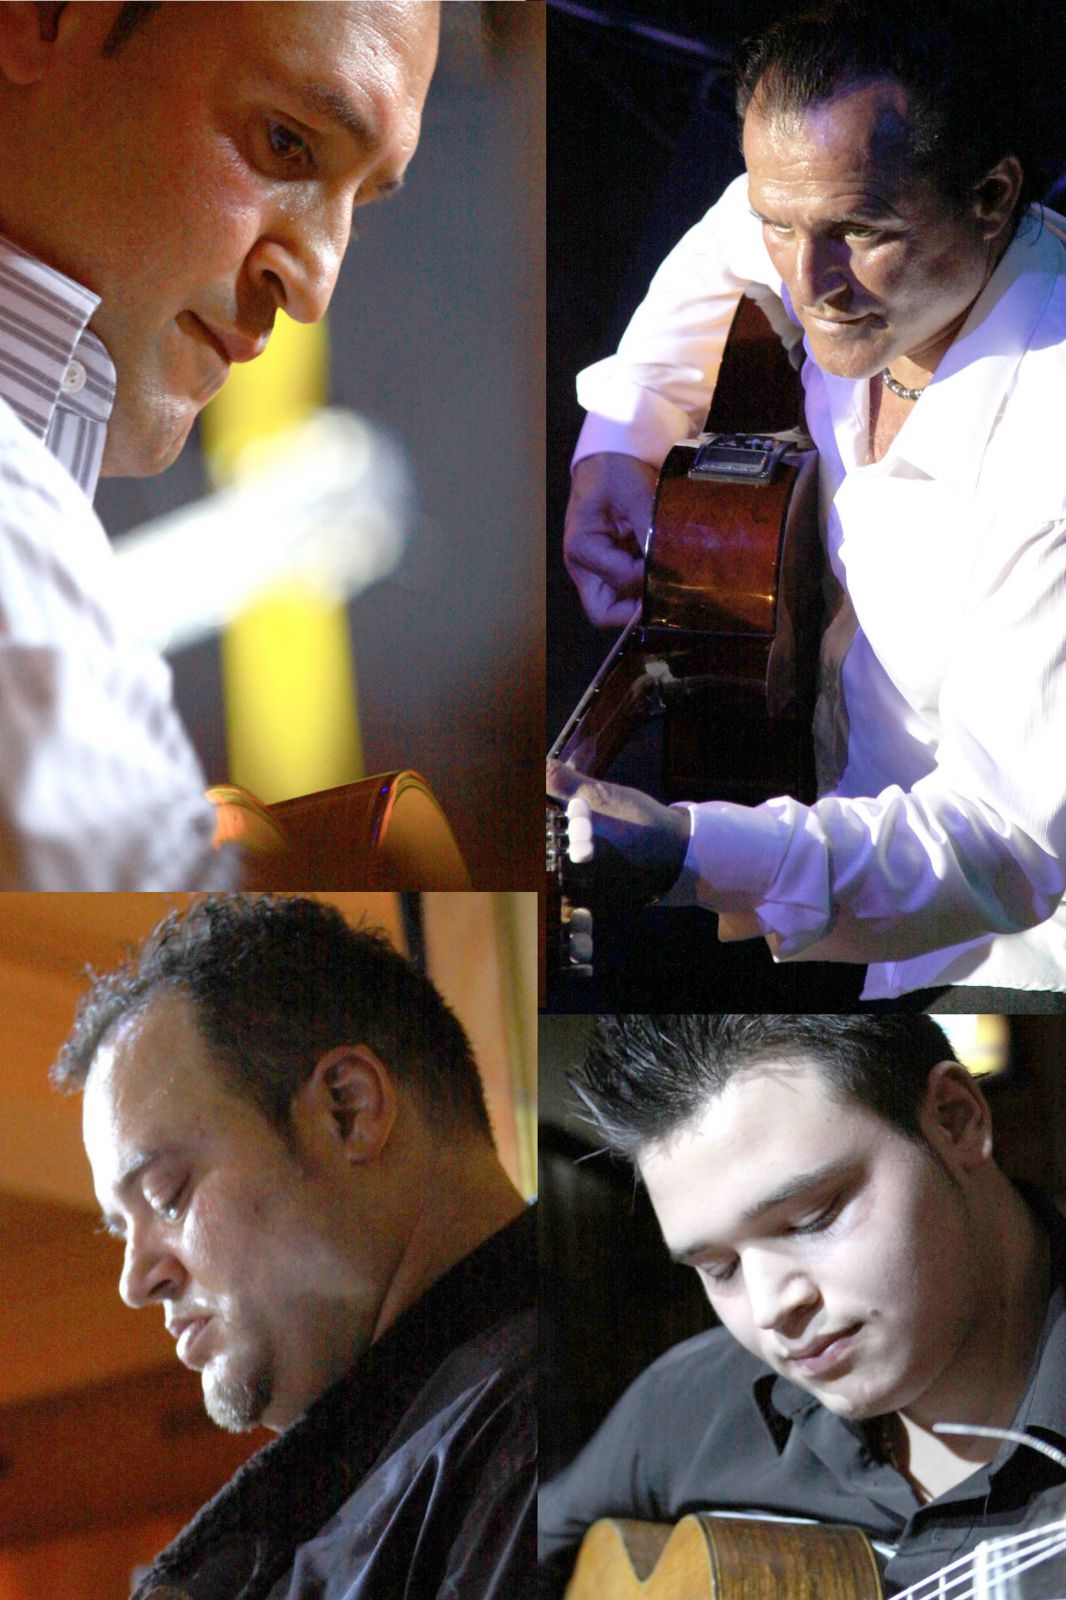 Mike+Moro-Reinhardt